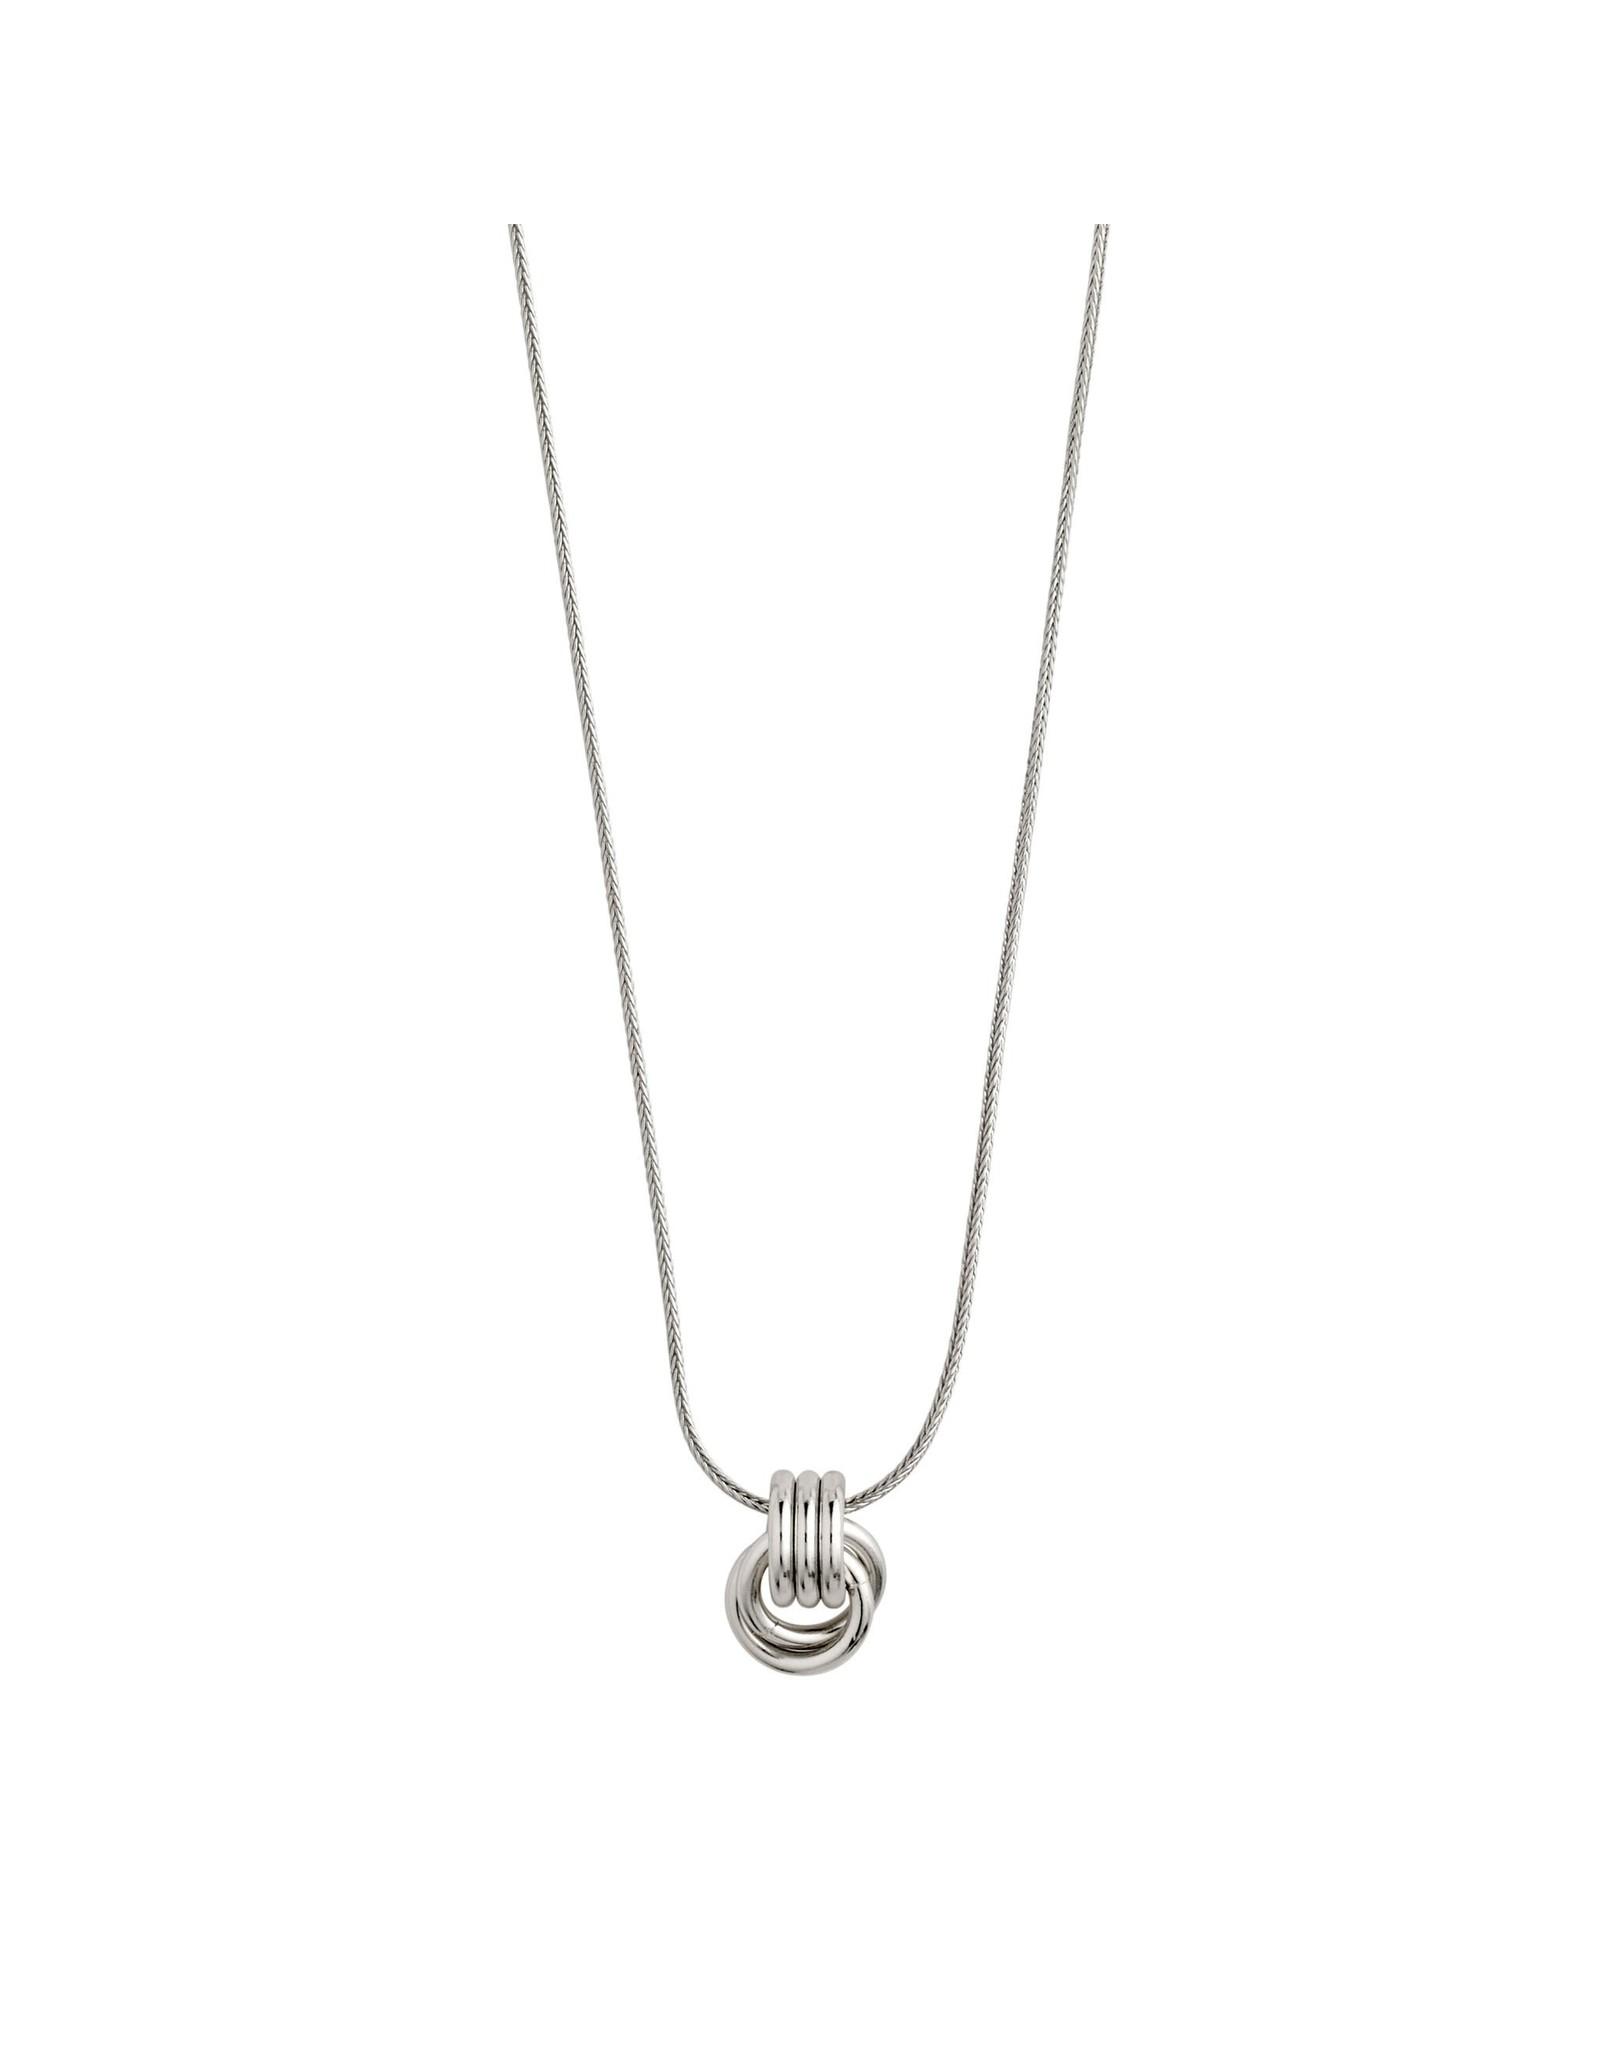 Pilgrim Pilgrim Doris Necklace Silver Plated